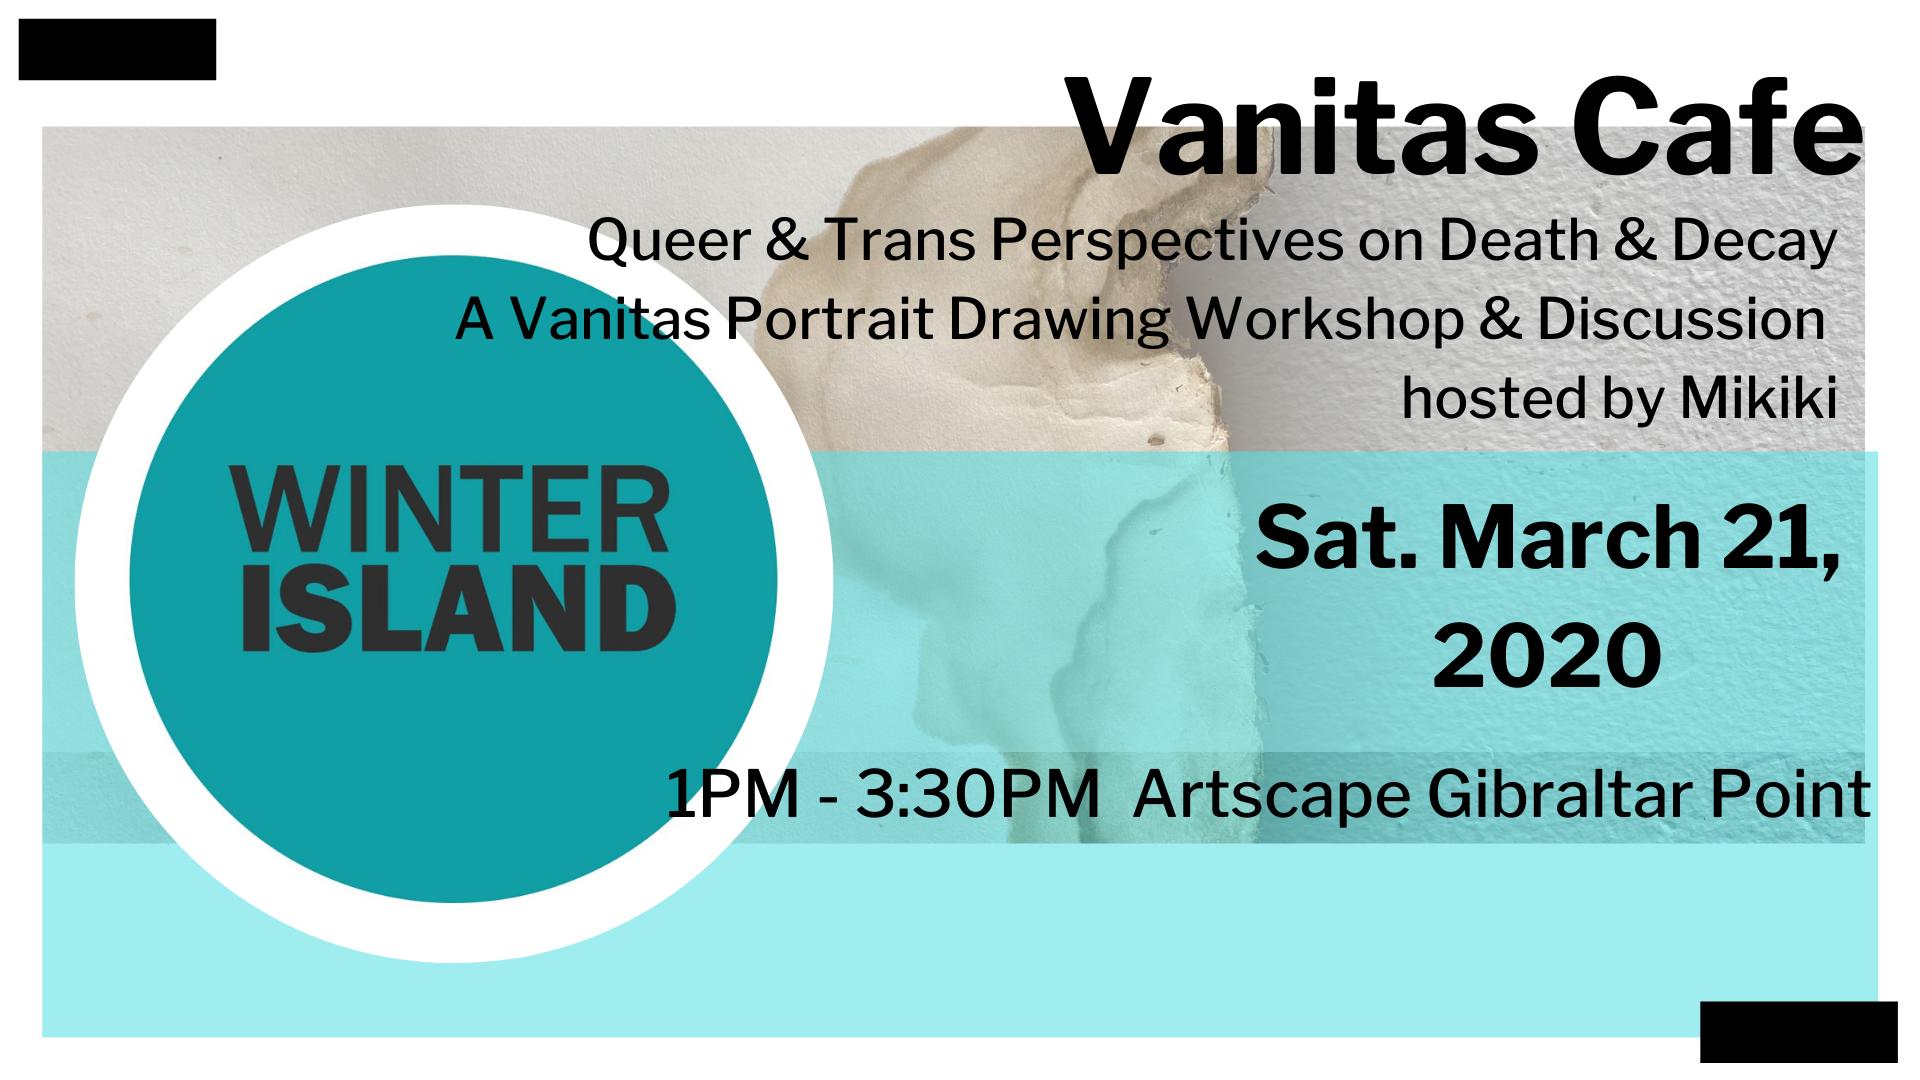 Vanitas Cafe: A Vanitas Drawing & Discussion Workshop